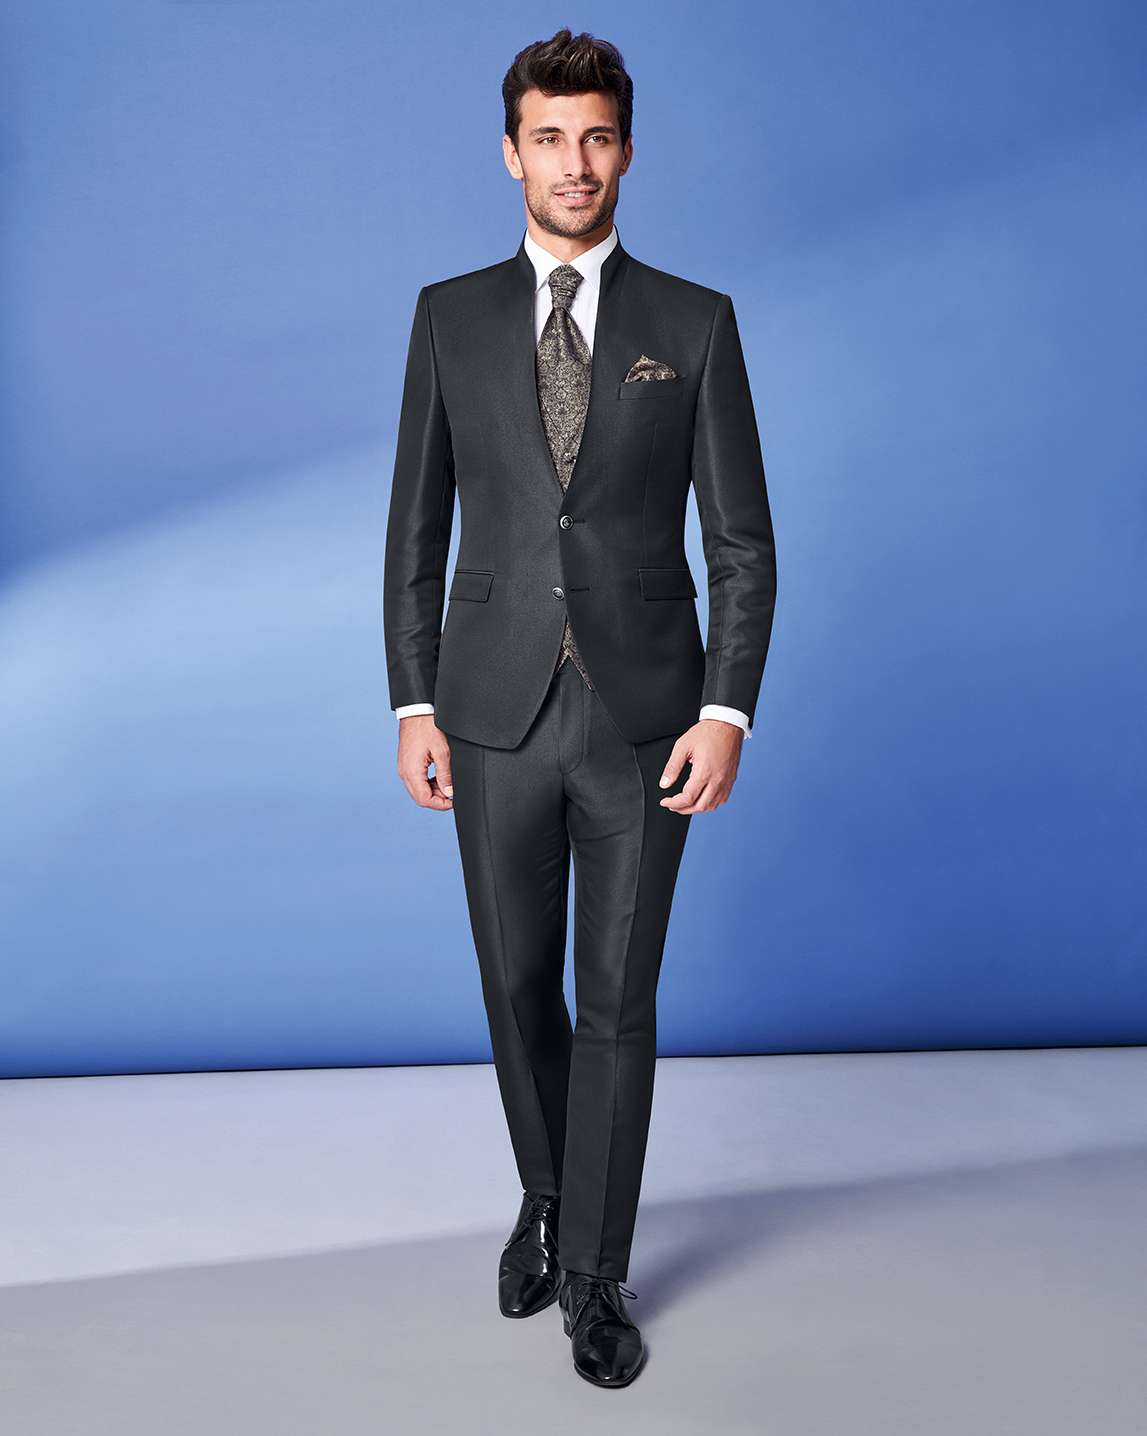 Satin Black 3 Piece Wedding Suit